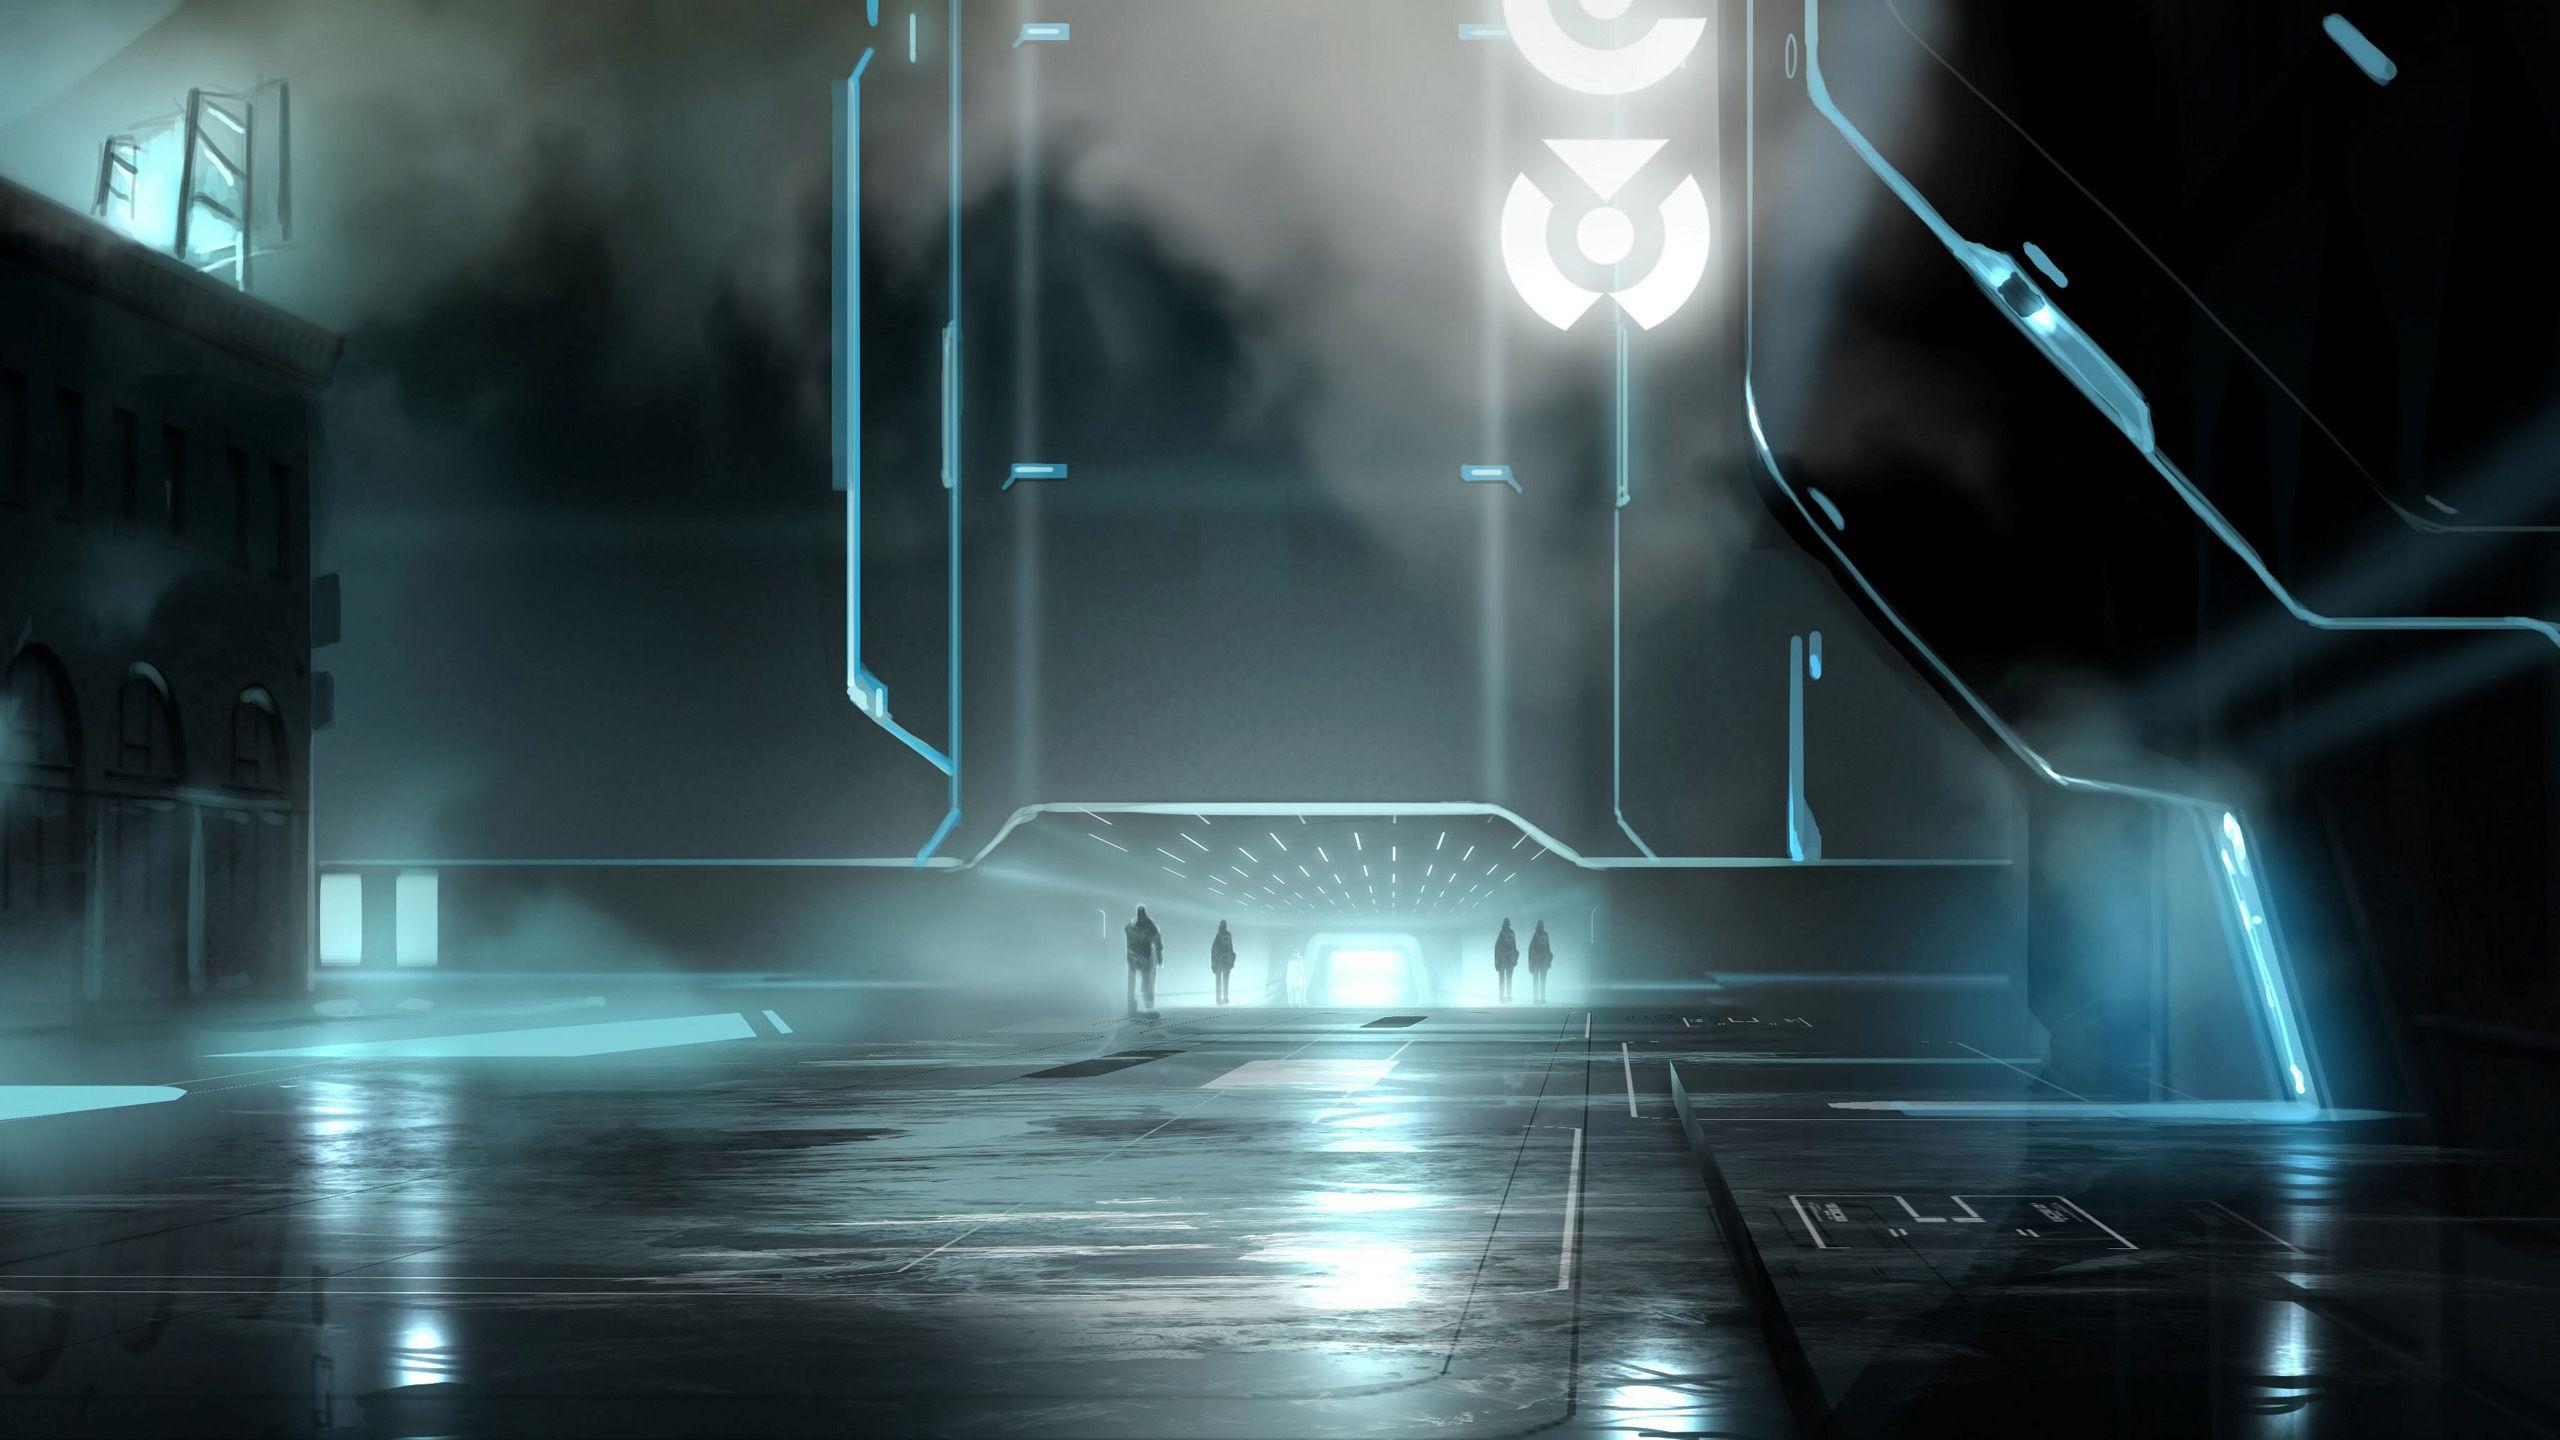 tron atmosphere | t20n | mood board | pinterest